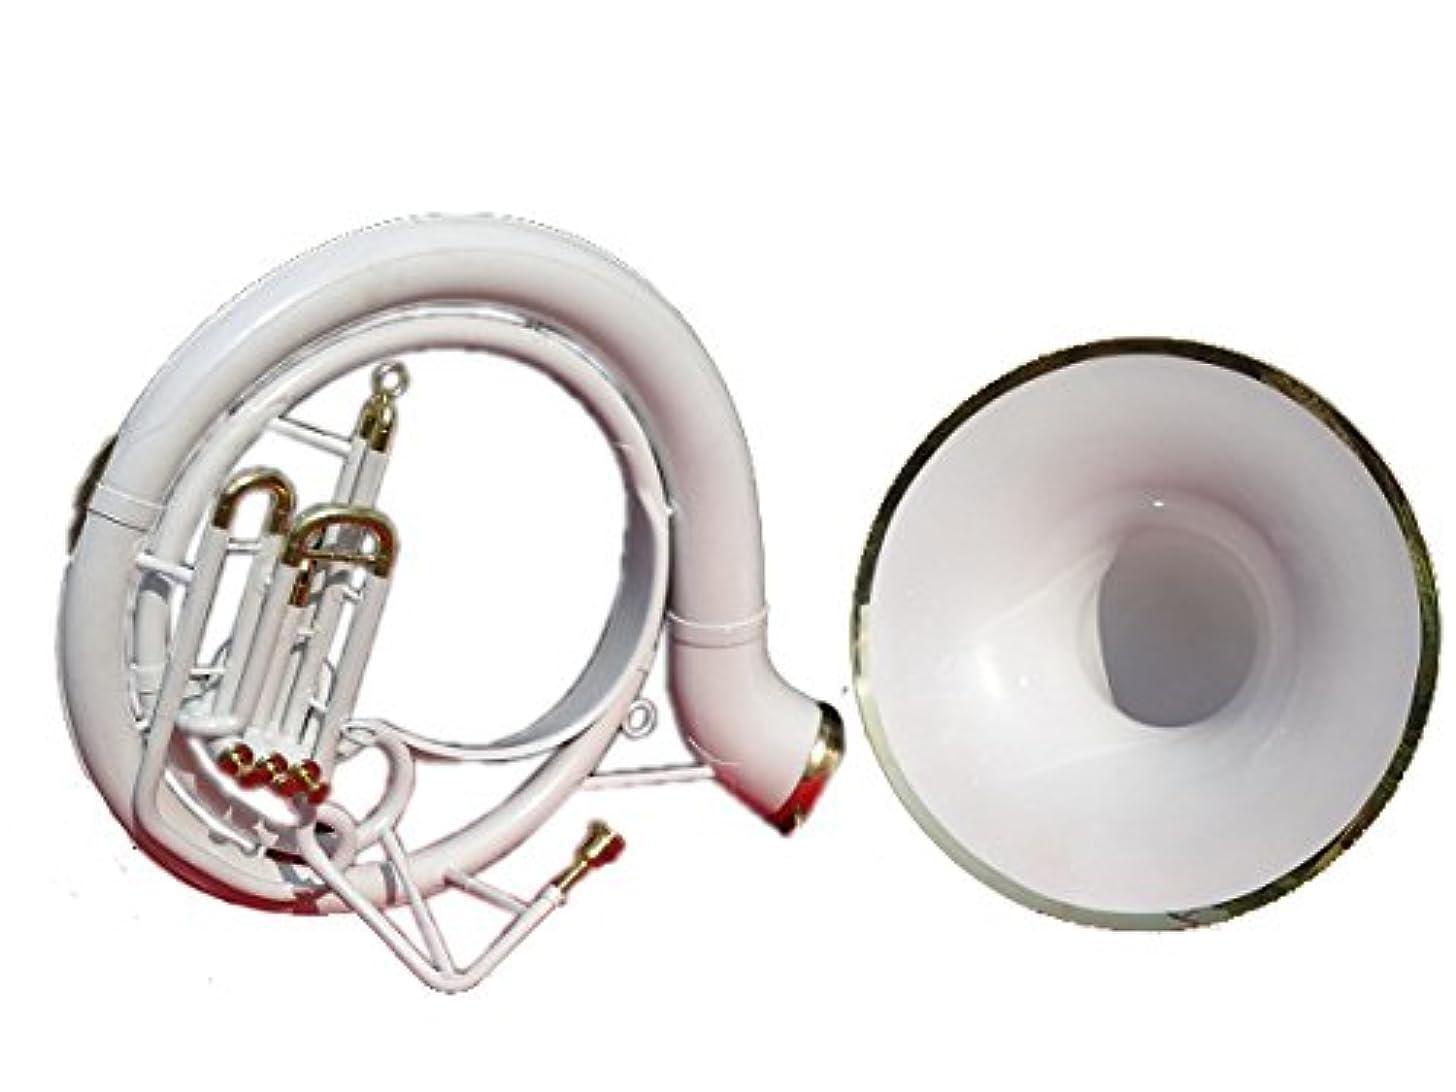 Queen Brass Sousaphone Tuba 25'' Bell_Bb Pitch W/Bag & Mp White